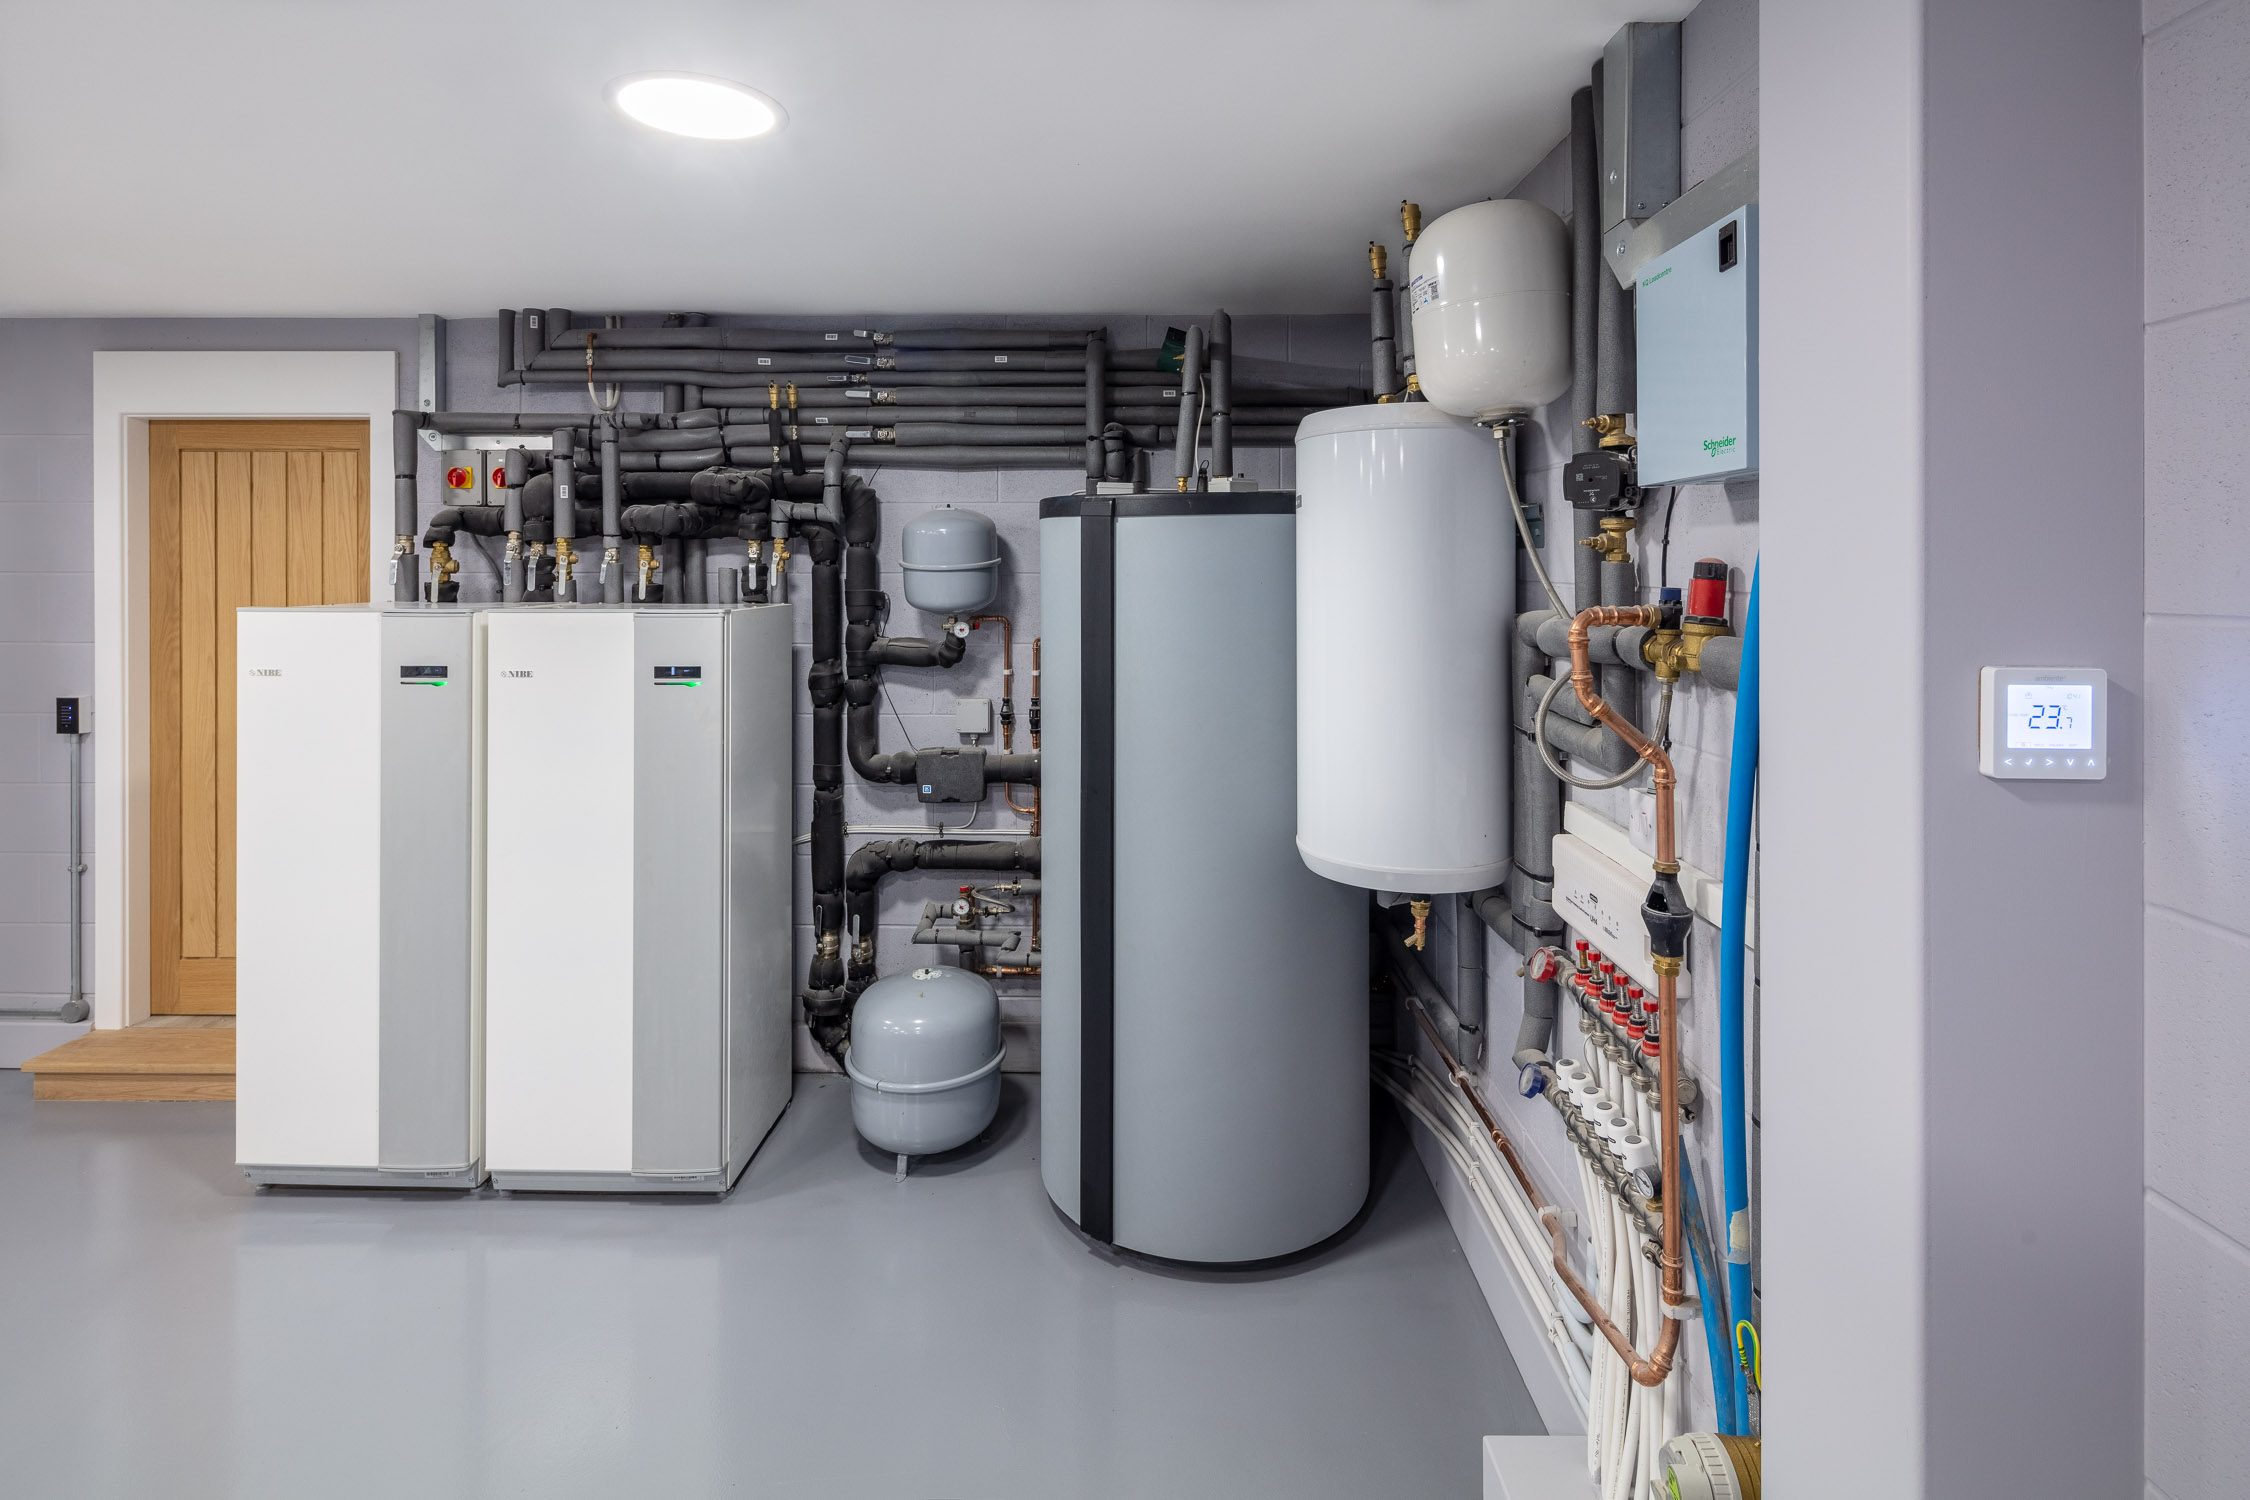 heat pump plant room.jpg